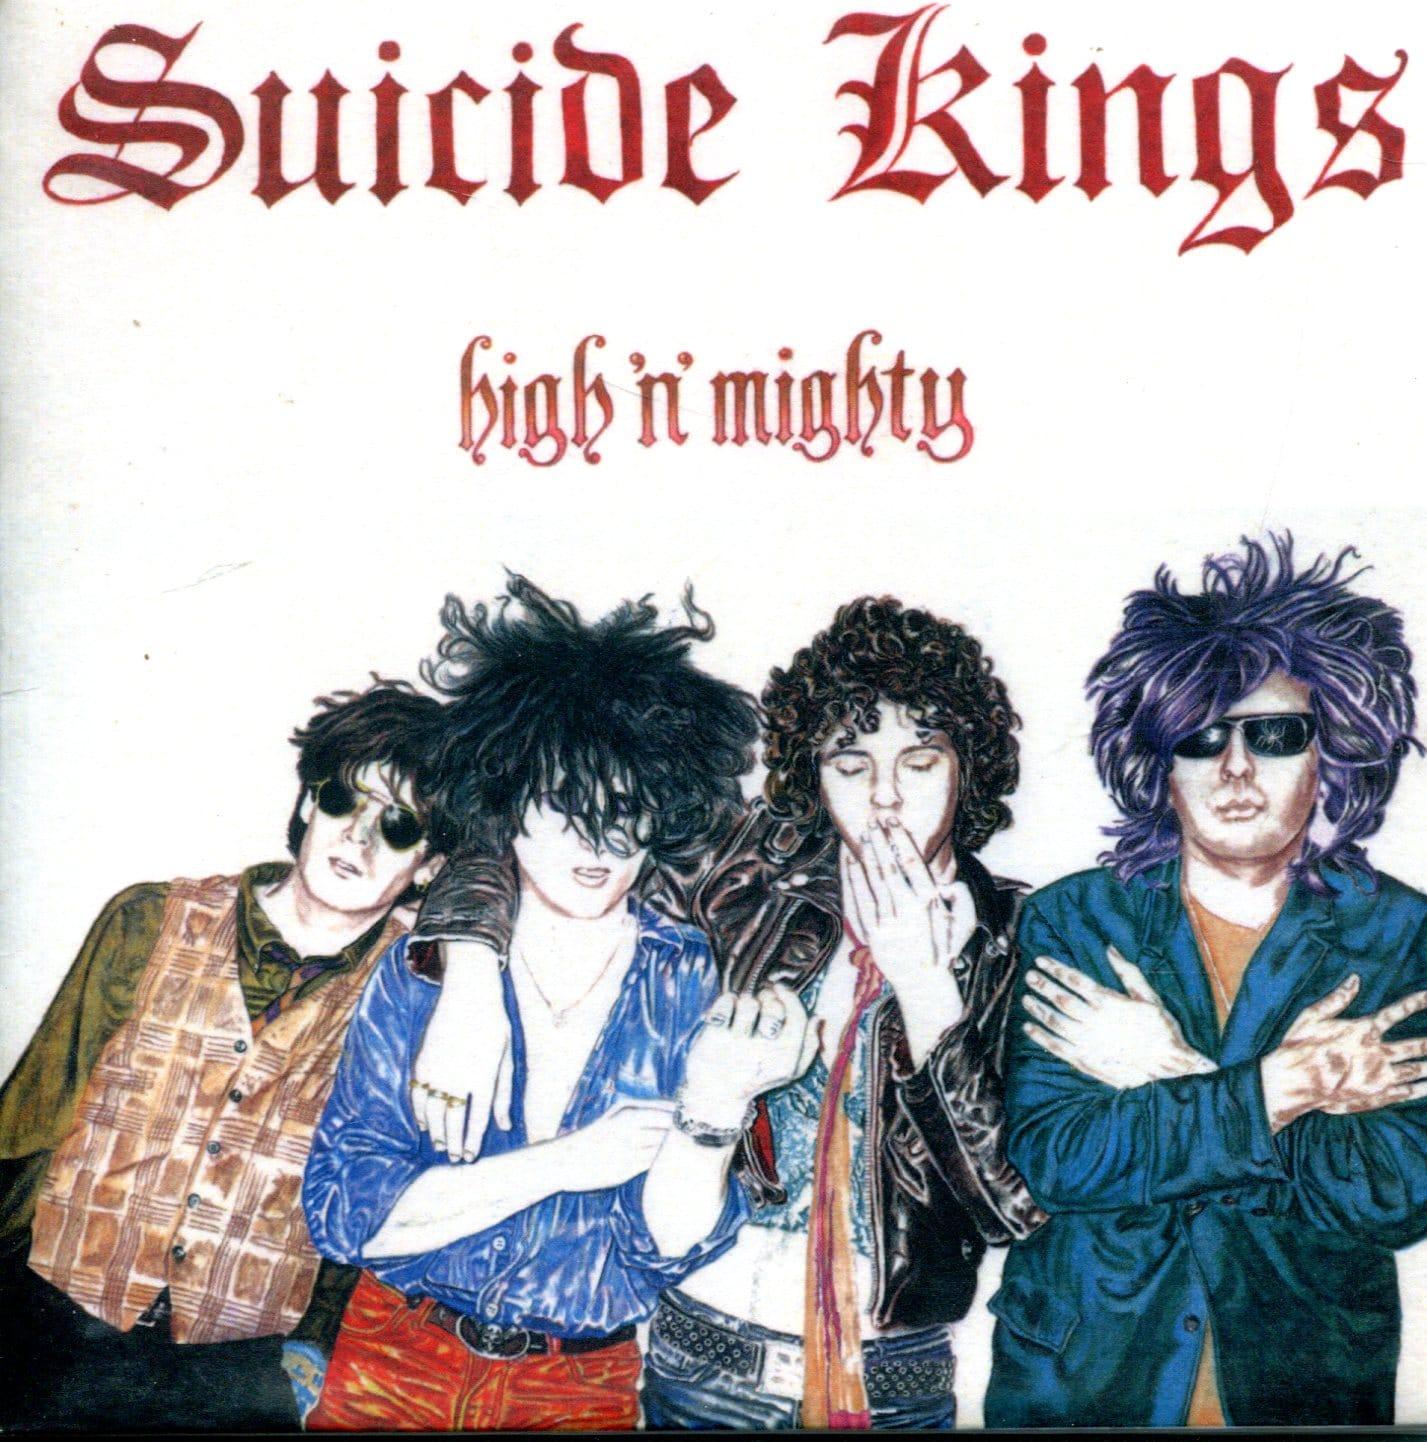 High 'n' Mighty Suicide Kings